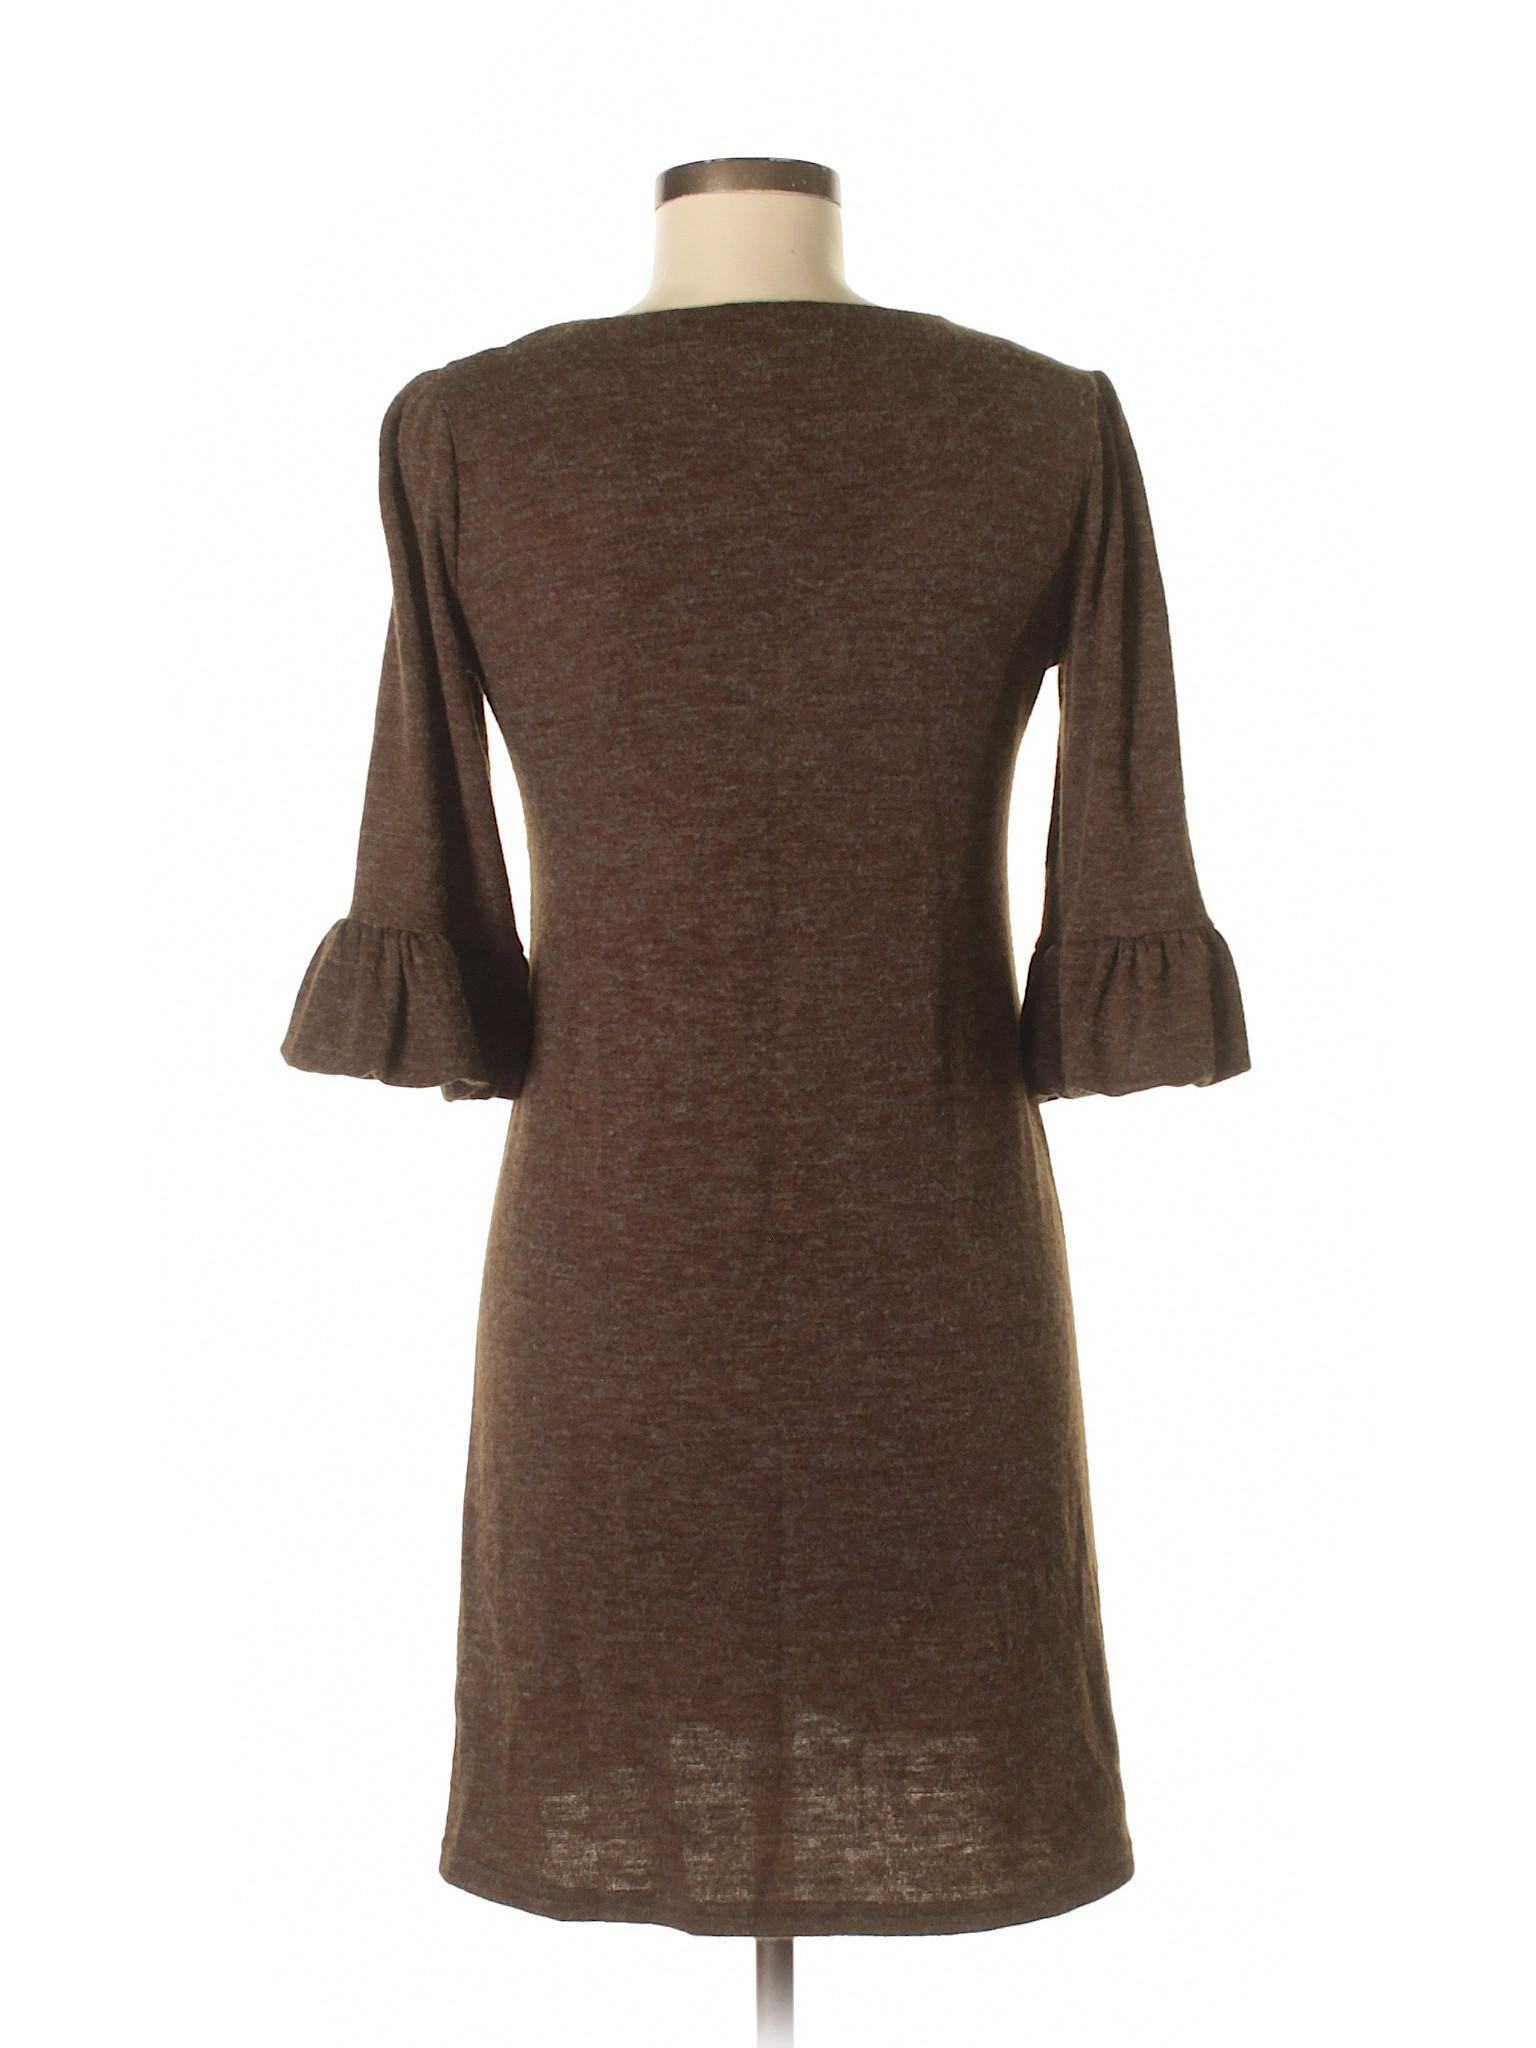 Boutique 12 Casual OB2 Dress winter r0A4Zrg